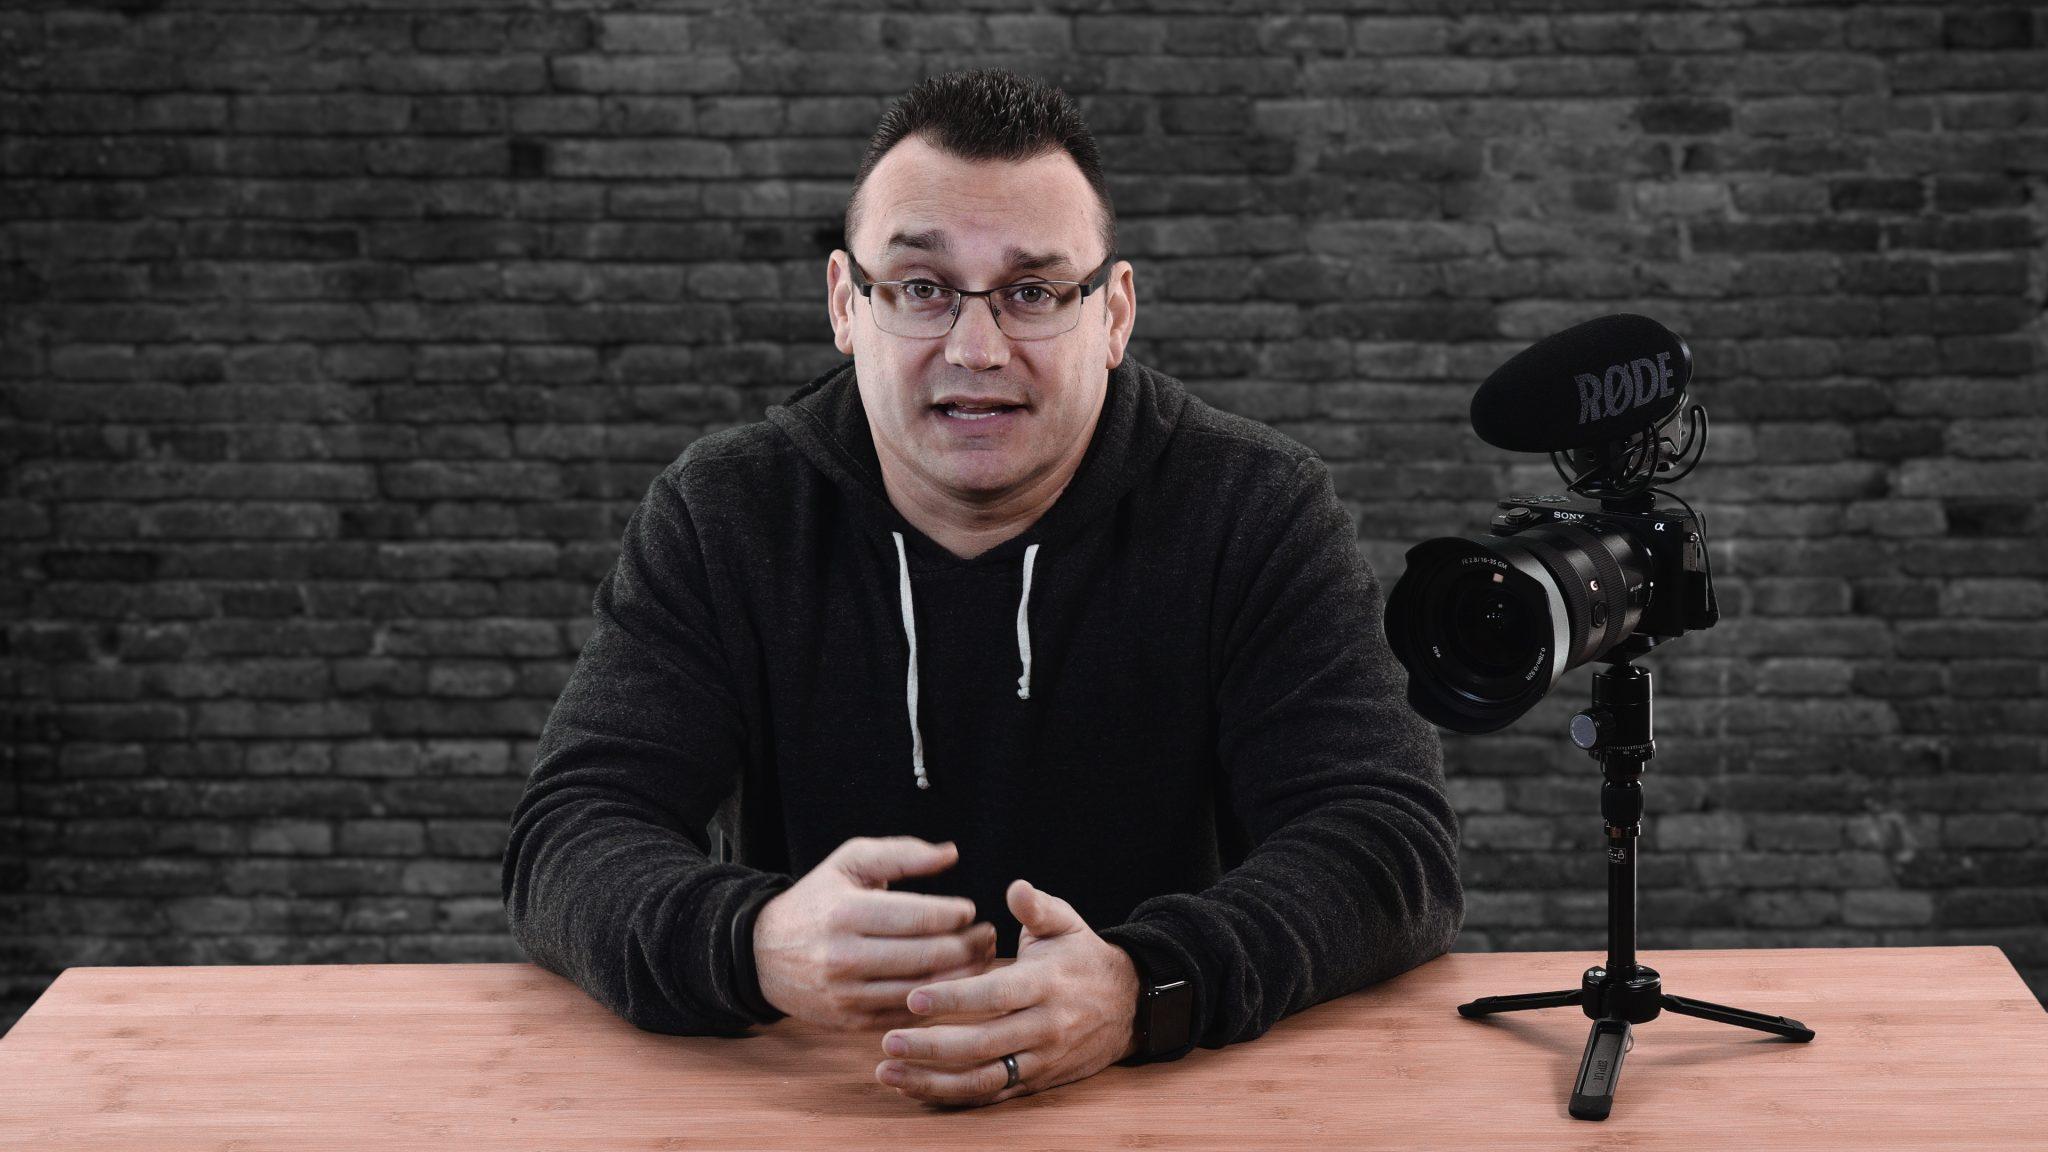 90-day vlog challenge